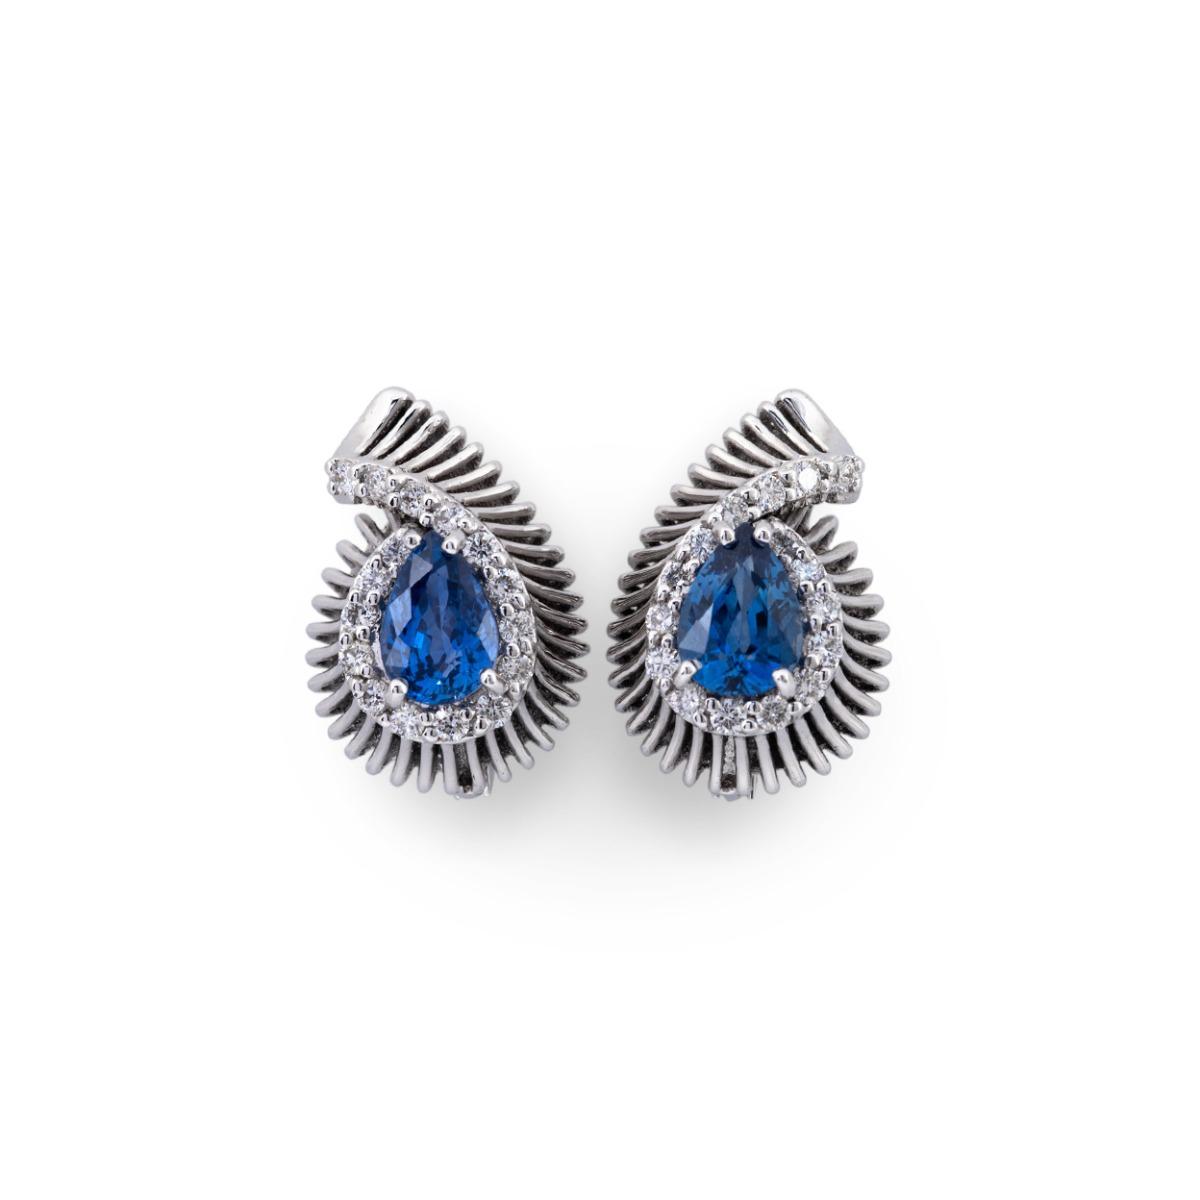 Pear-Cut Sapphire and Diamond Stud Earrings